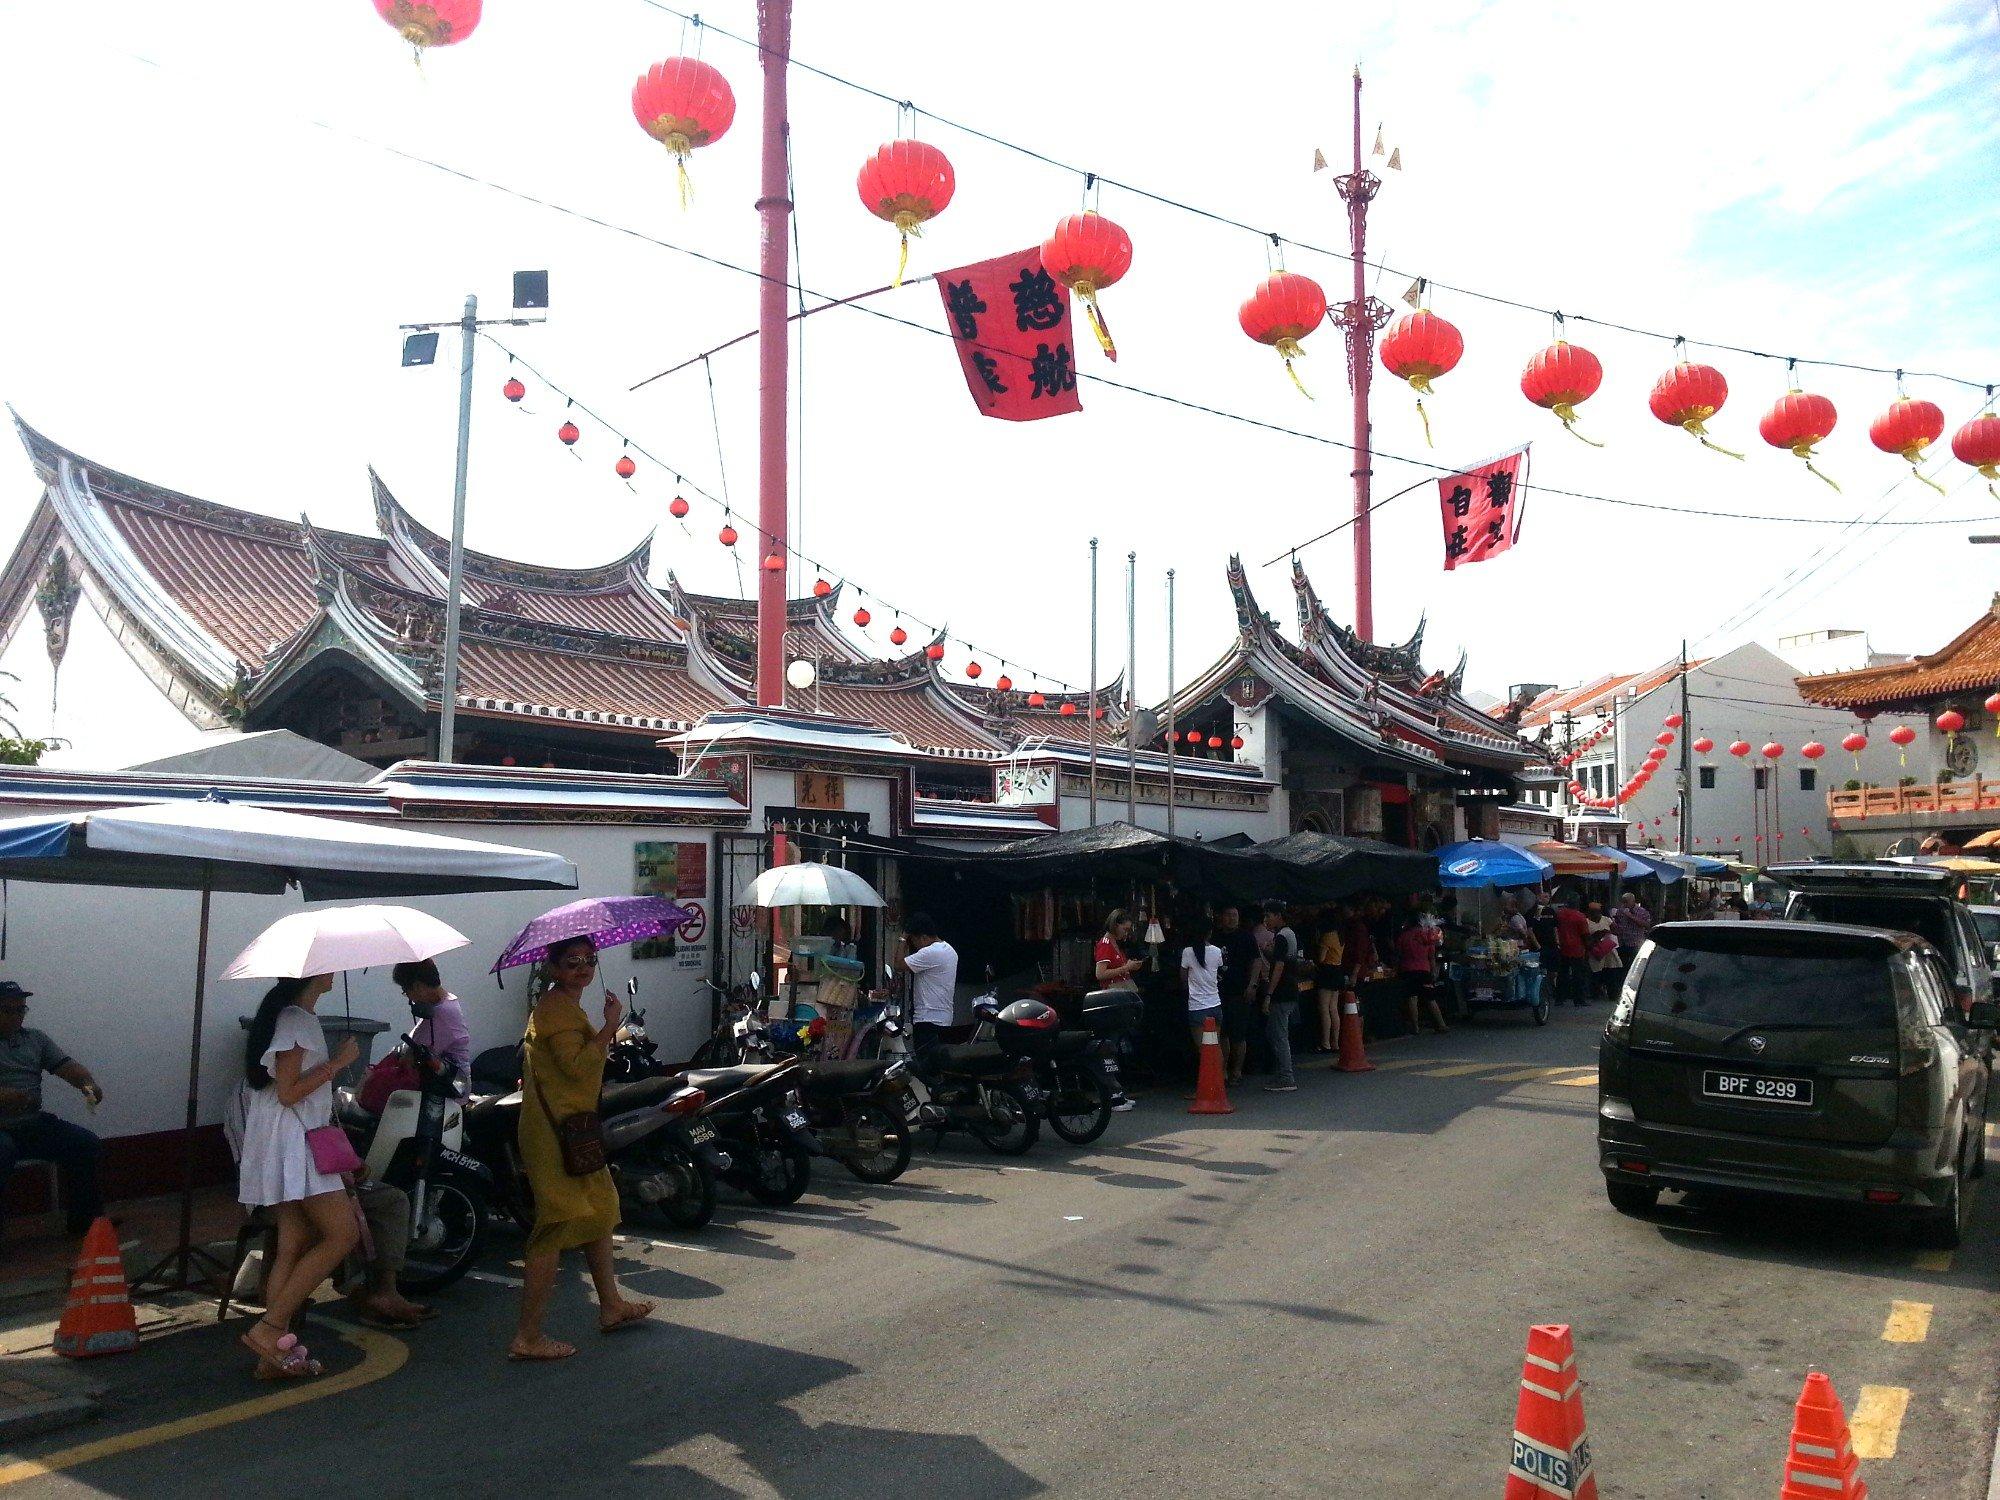 Cheng Hoon Teng Temple in Melaka